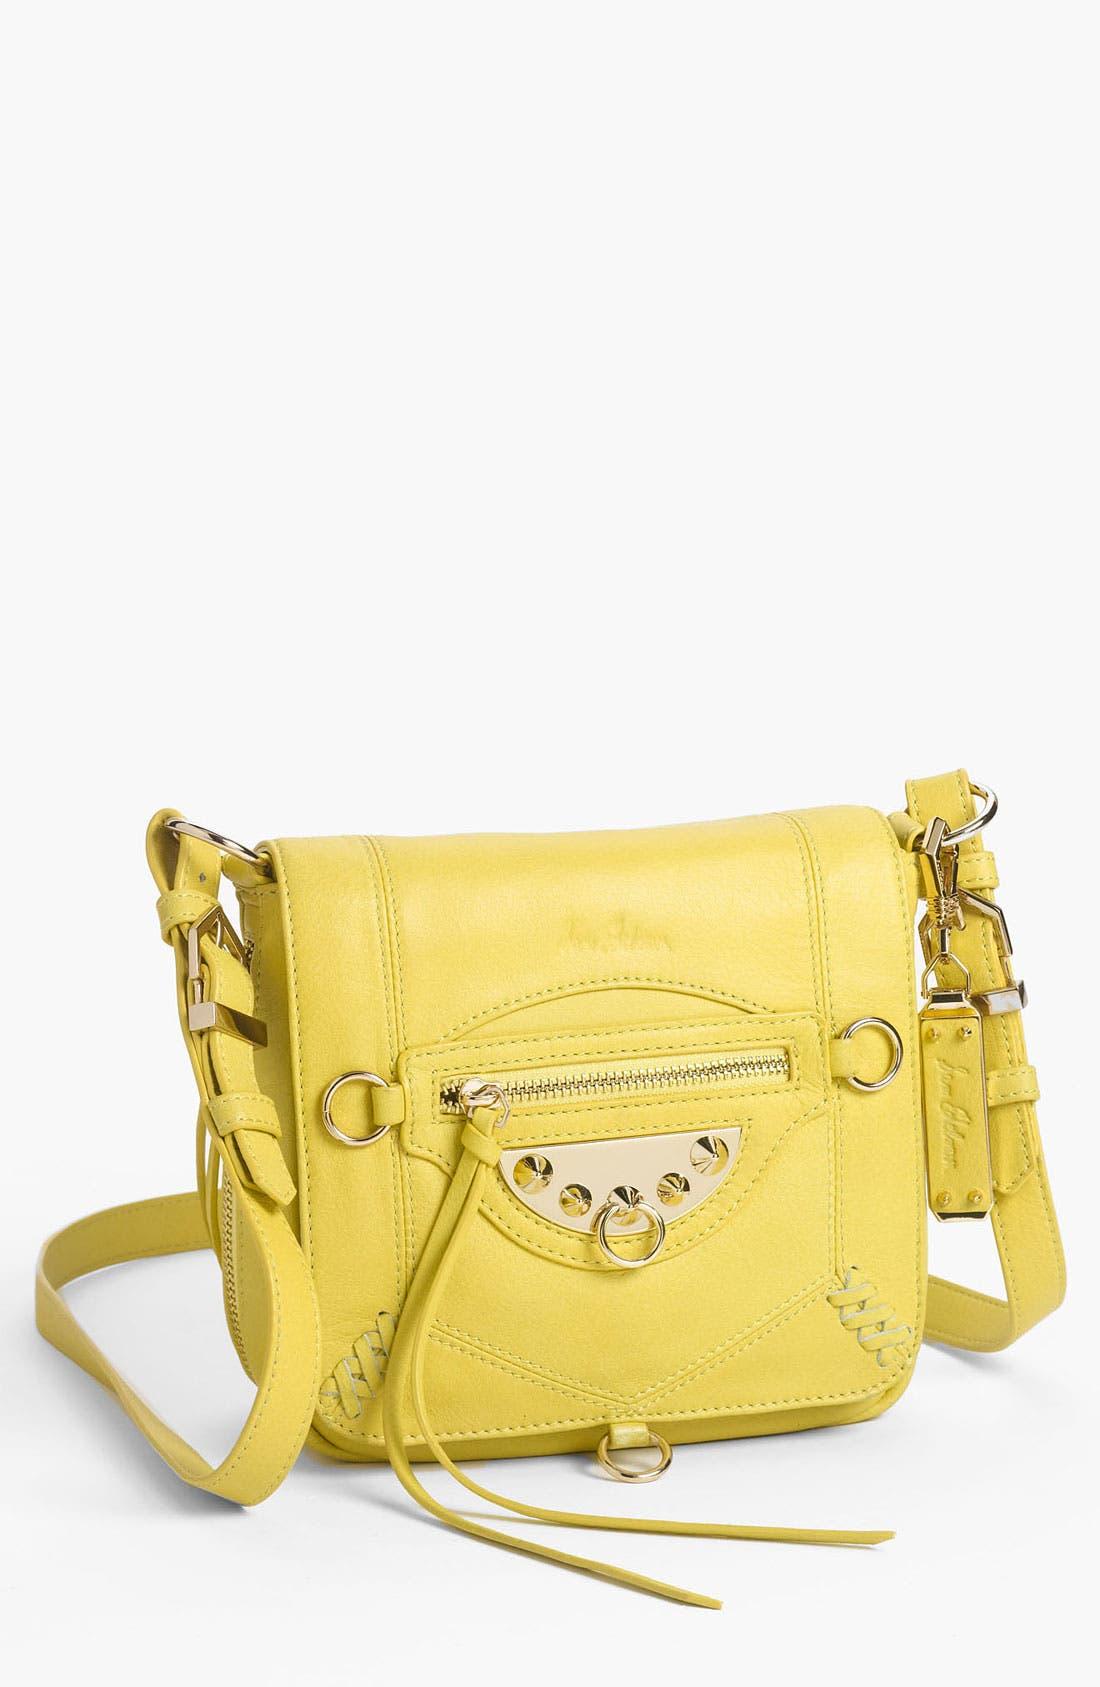 Alternate Image 1 Selected - Sam Edelman 'Marais Oriana' Crossbody Bag